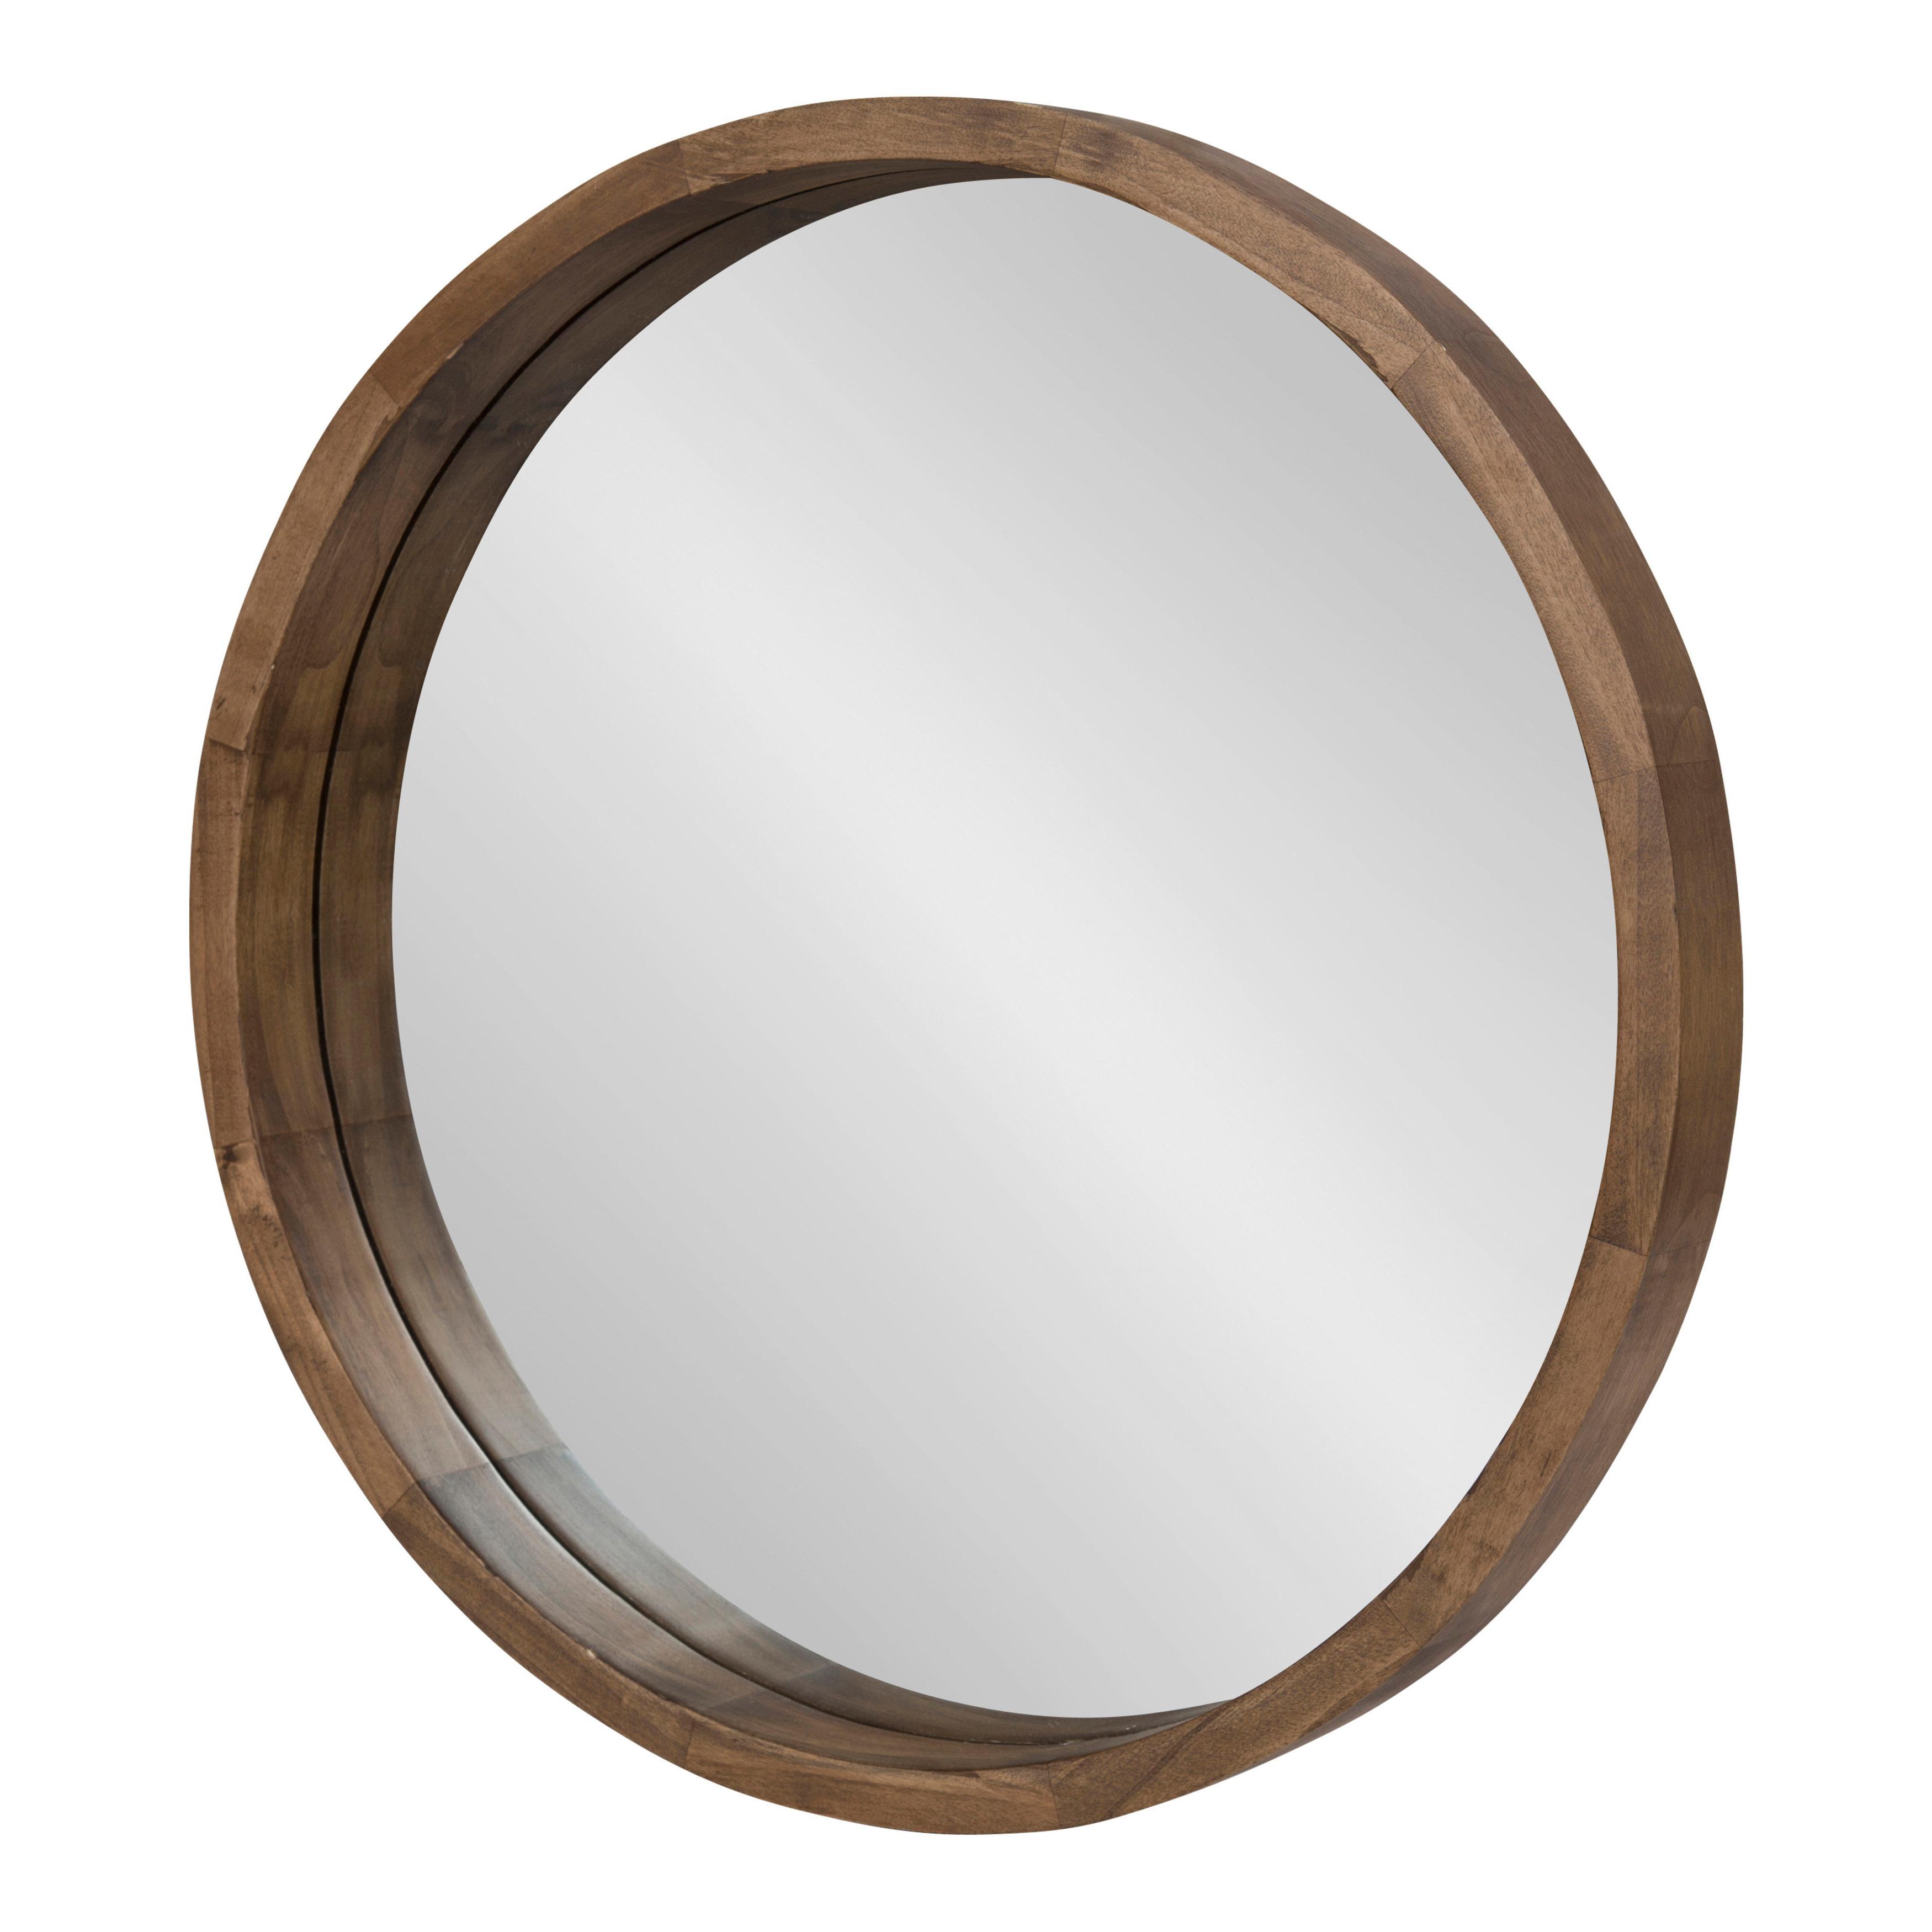 Newest Loftis Decorative Wall Mirror Regarding Decorative Wall Mirrors (Gallery 12 of 20)